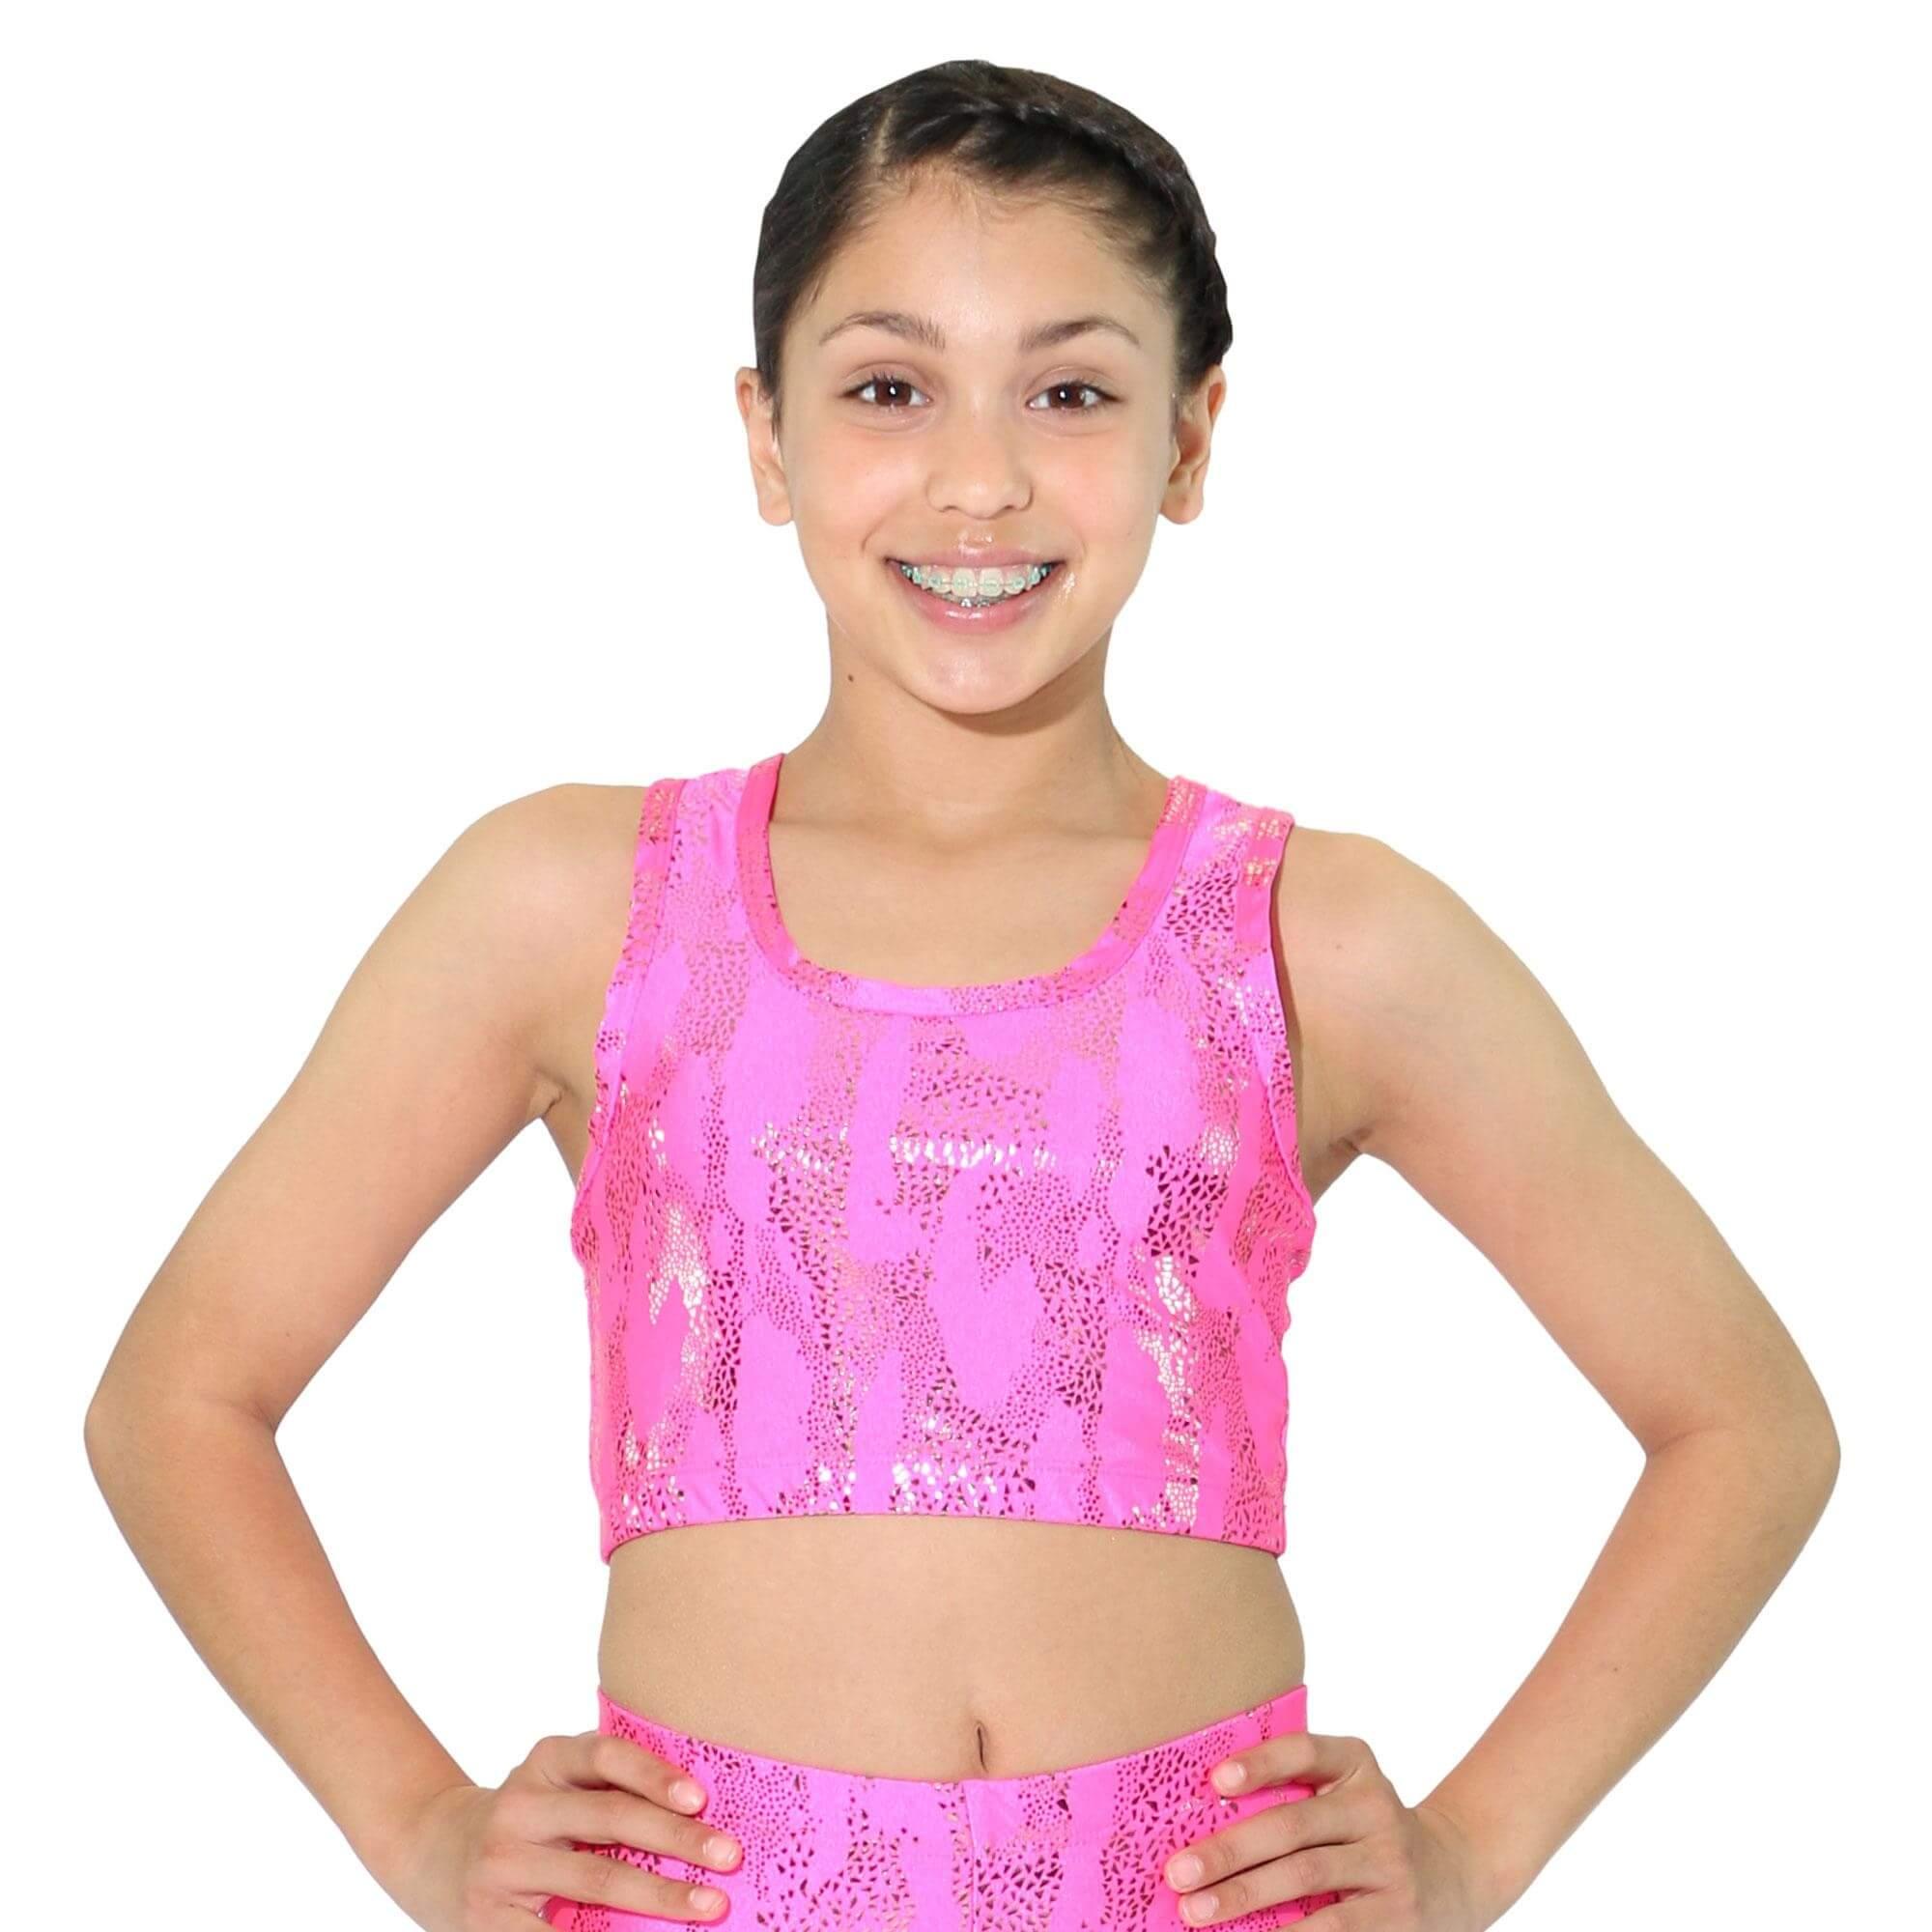 124bfd75408 Reflectionz: leotards for girls, gymnastics, girls gymnastics ...